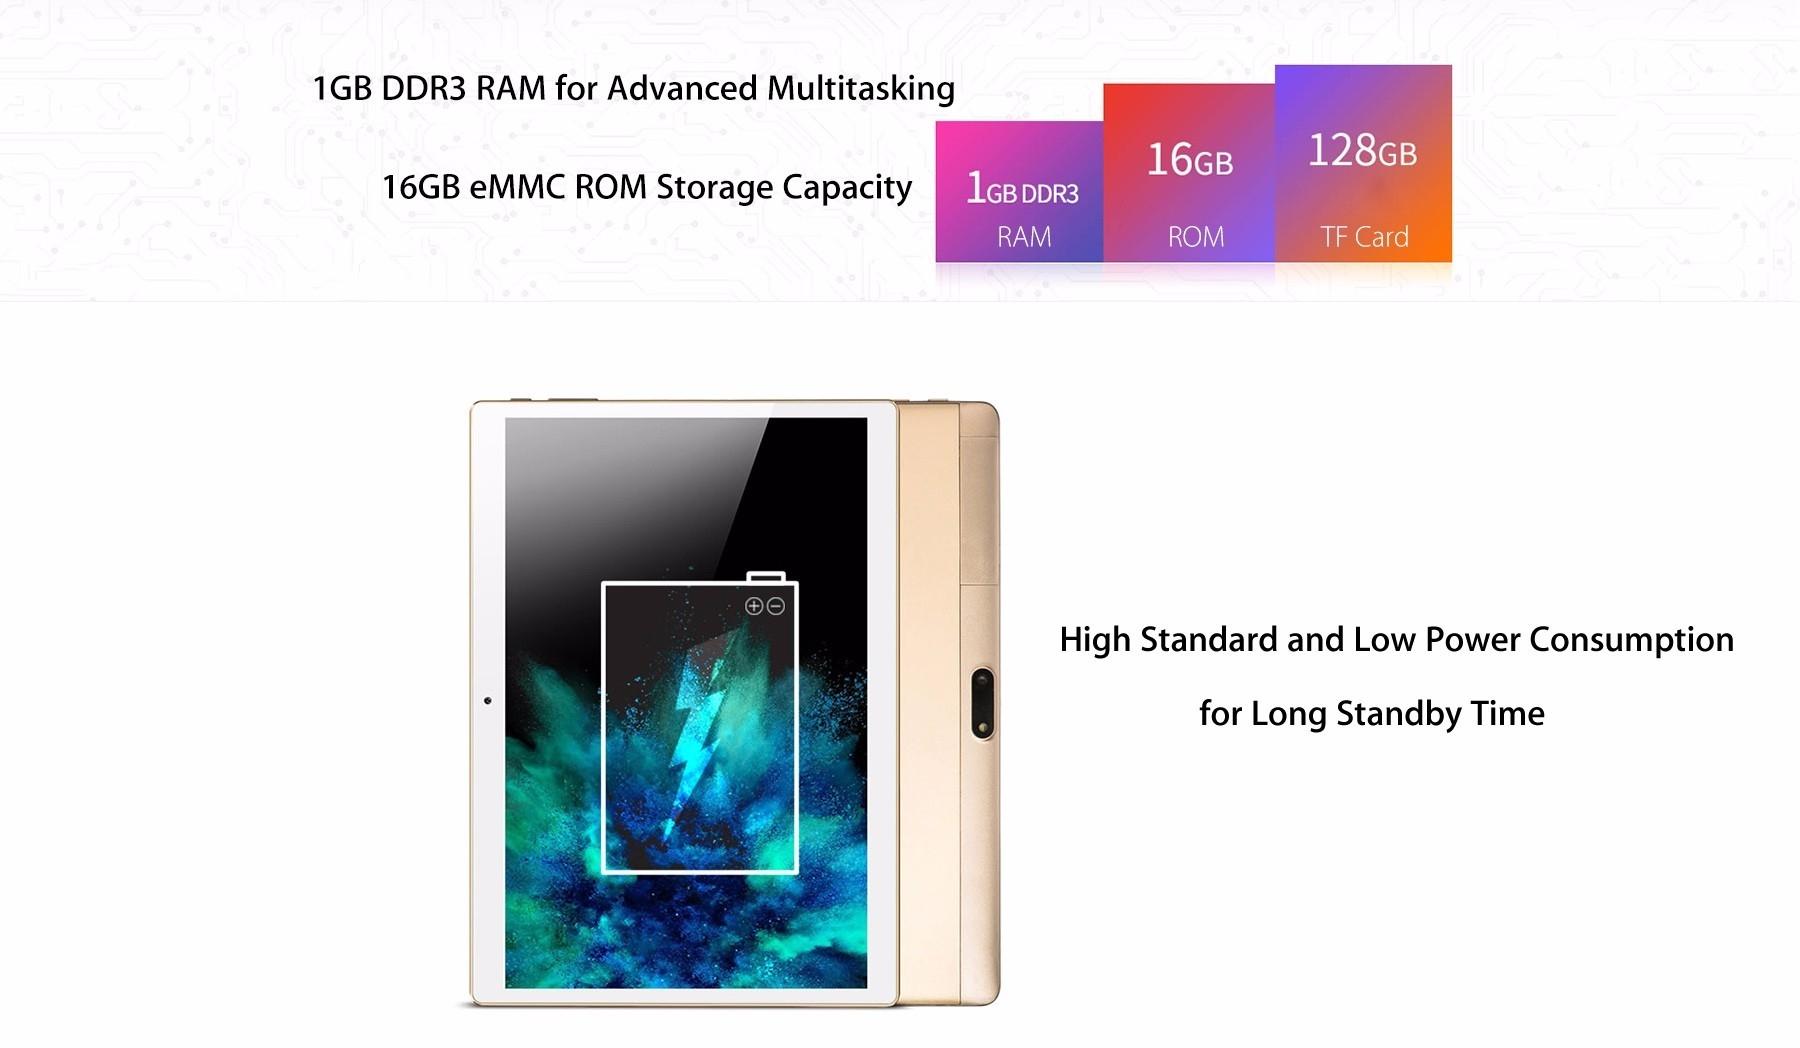 Onda V10 3G Phablet 10.1 inch IPS Screen Android 5.1 MTK8321 1.3GHz Quad Core 1GB RAM 16GB eMMC Dual Cameras GPS